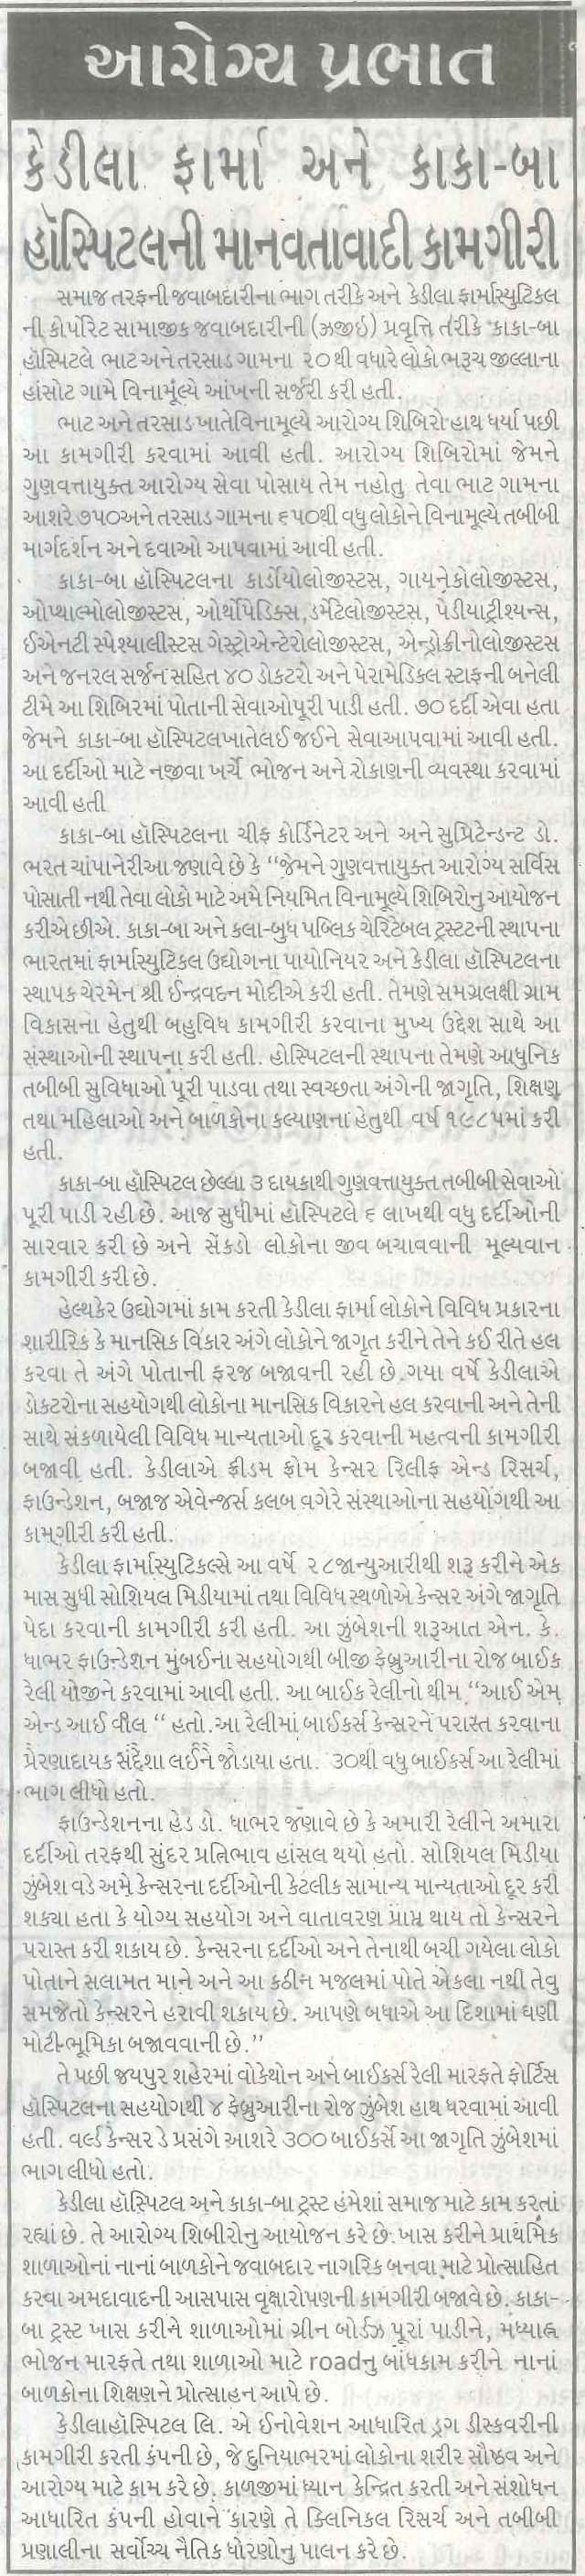 Prabhat Coverage